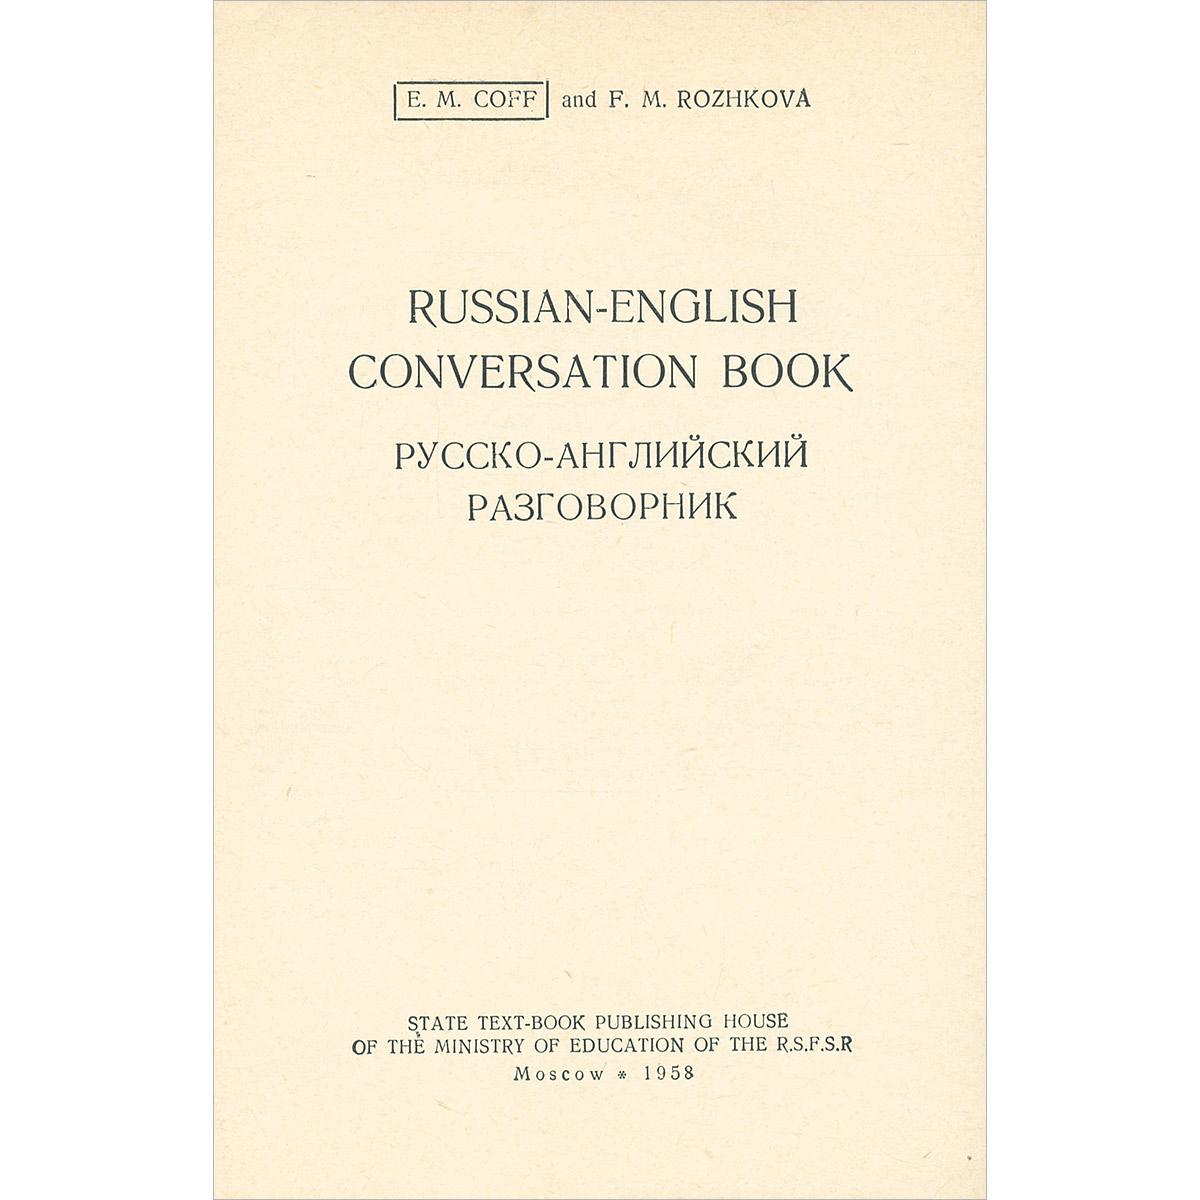 Russian-English Conversation Book / ������-���������� �����������